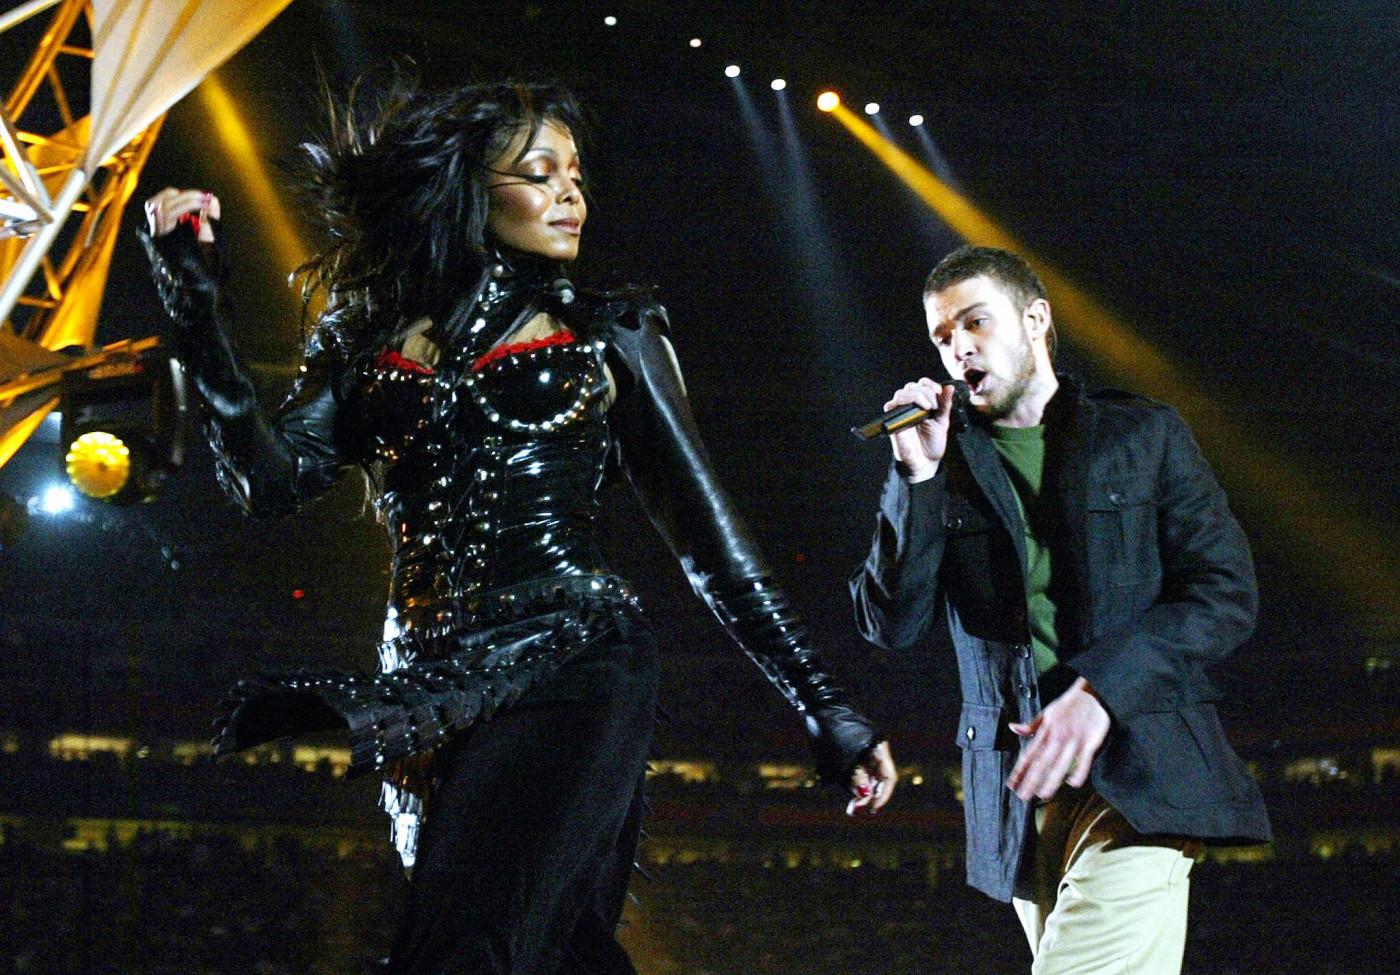 Janet Jackson and Justin Timberlake